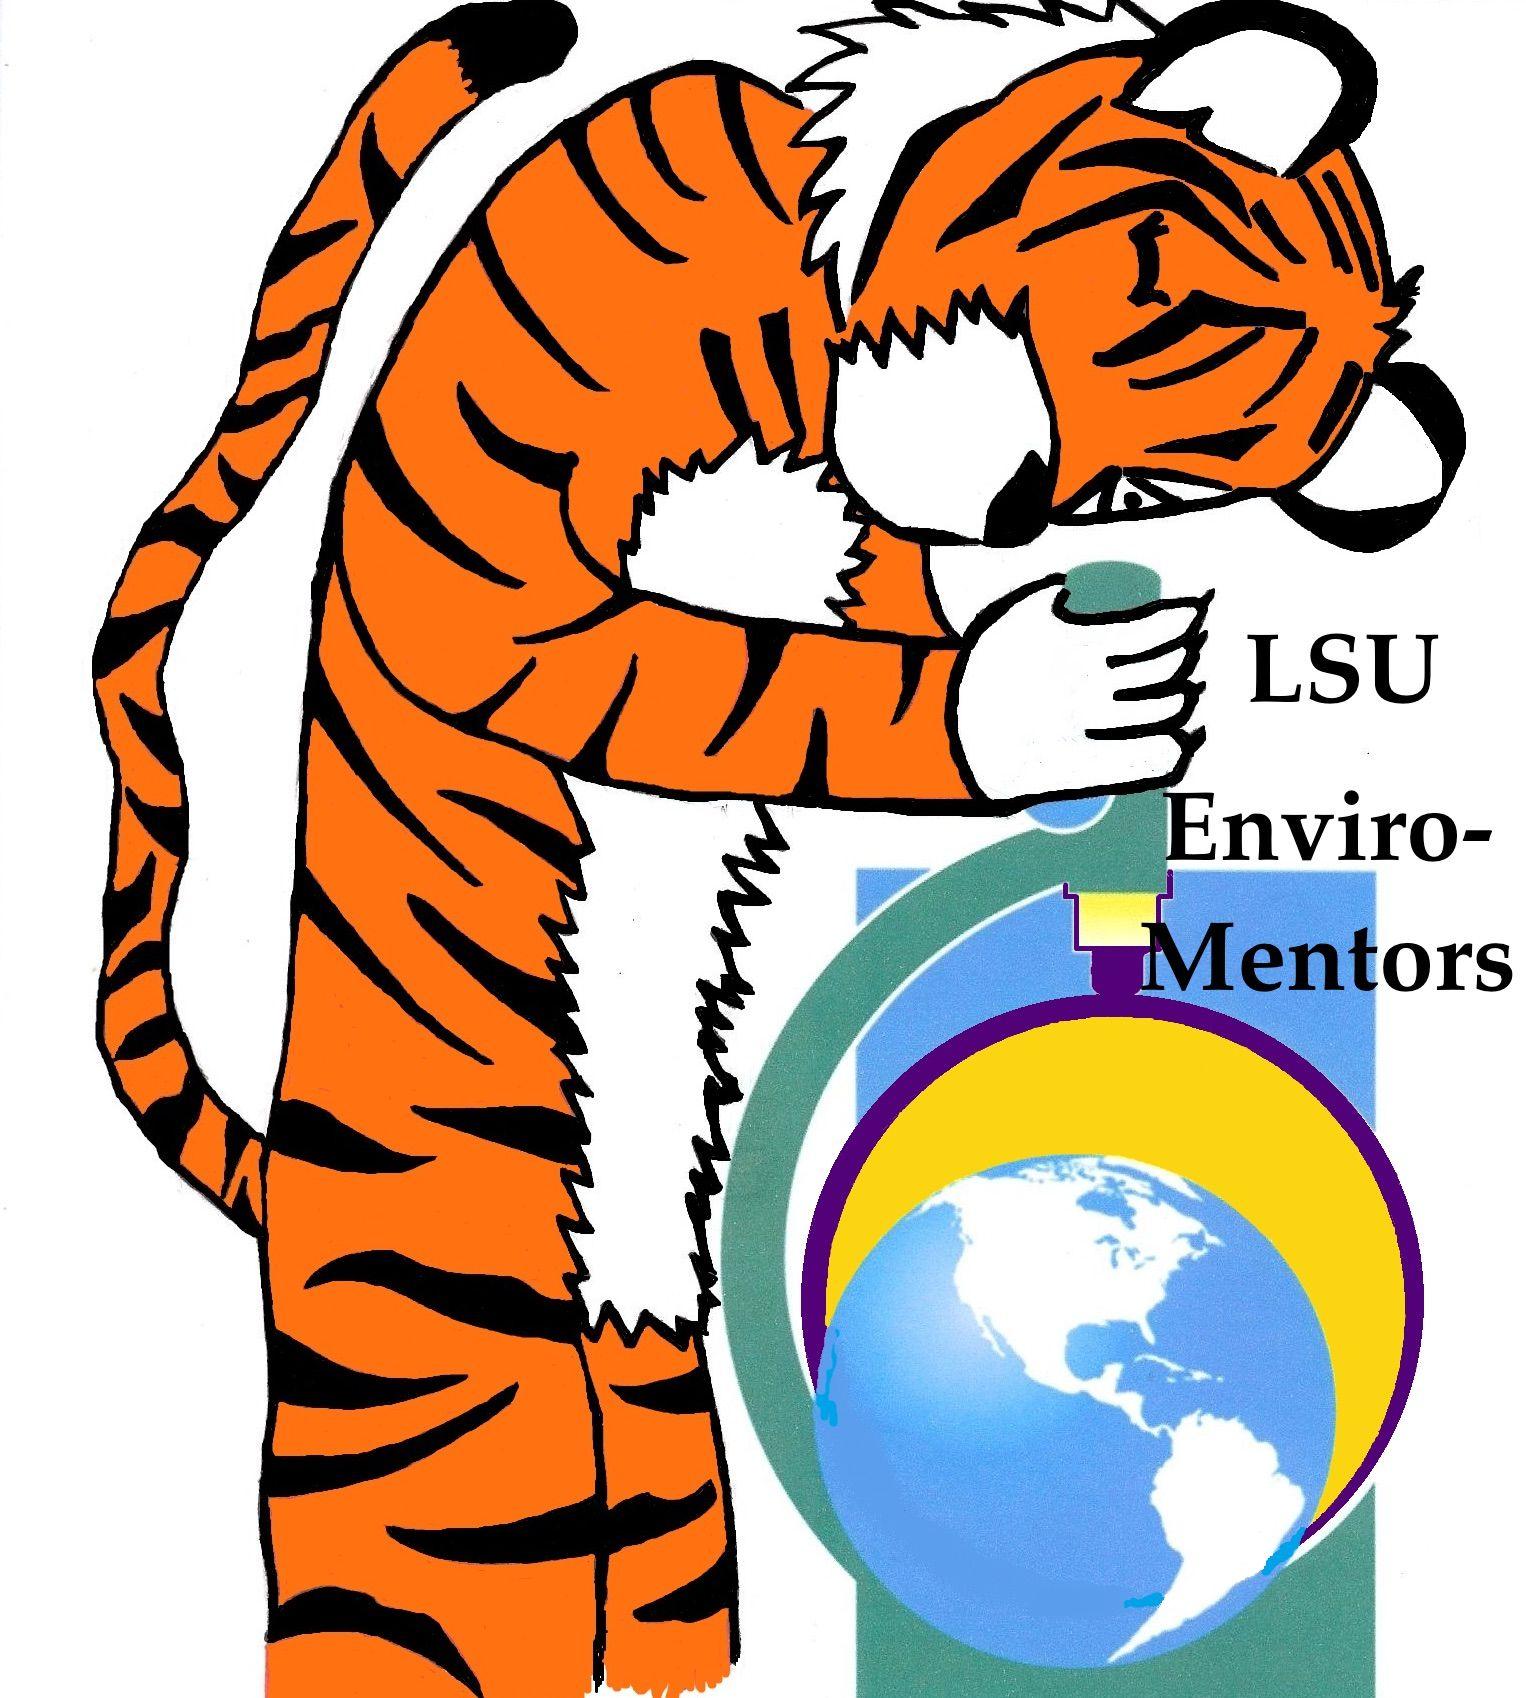 LSU Enviromentors